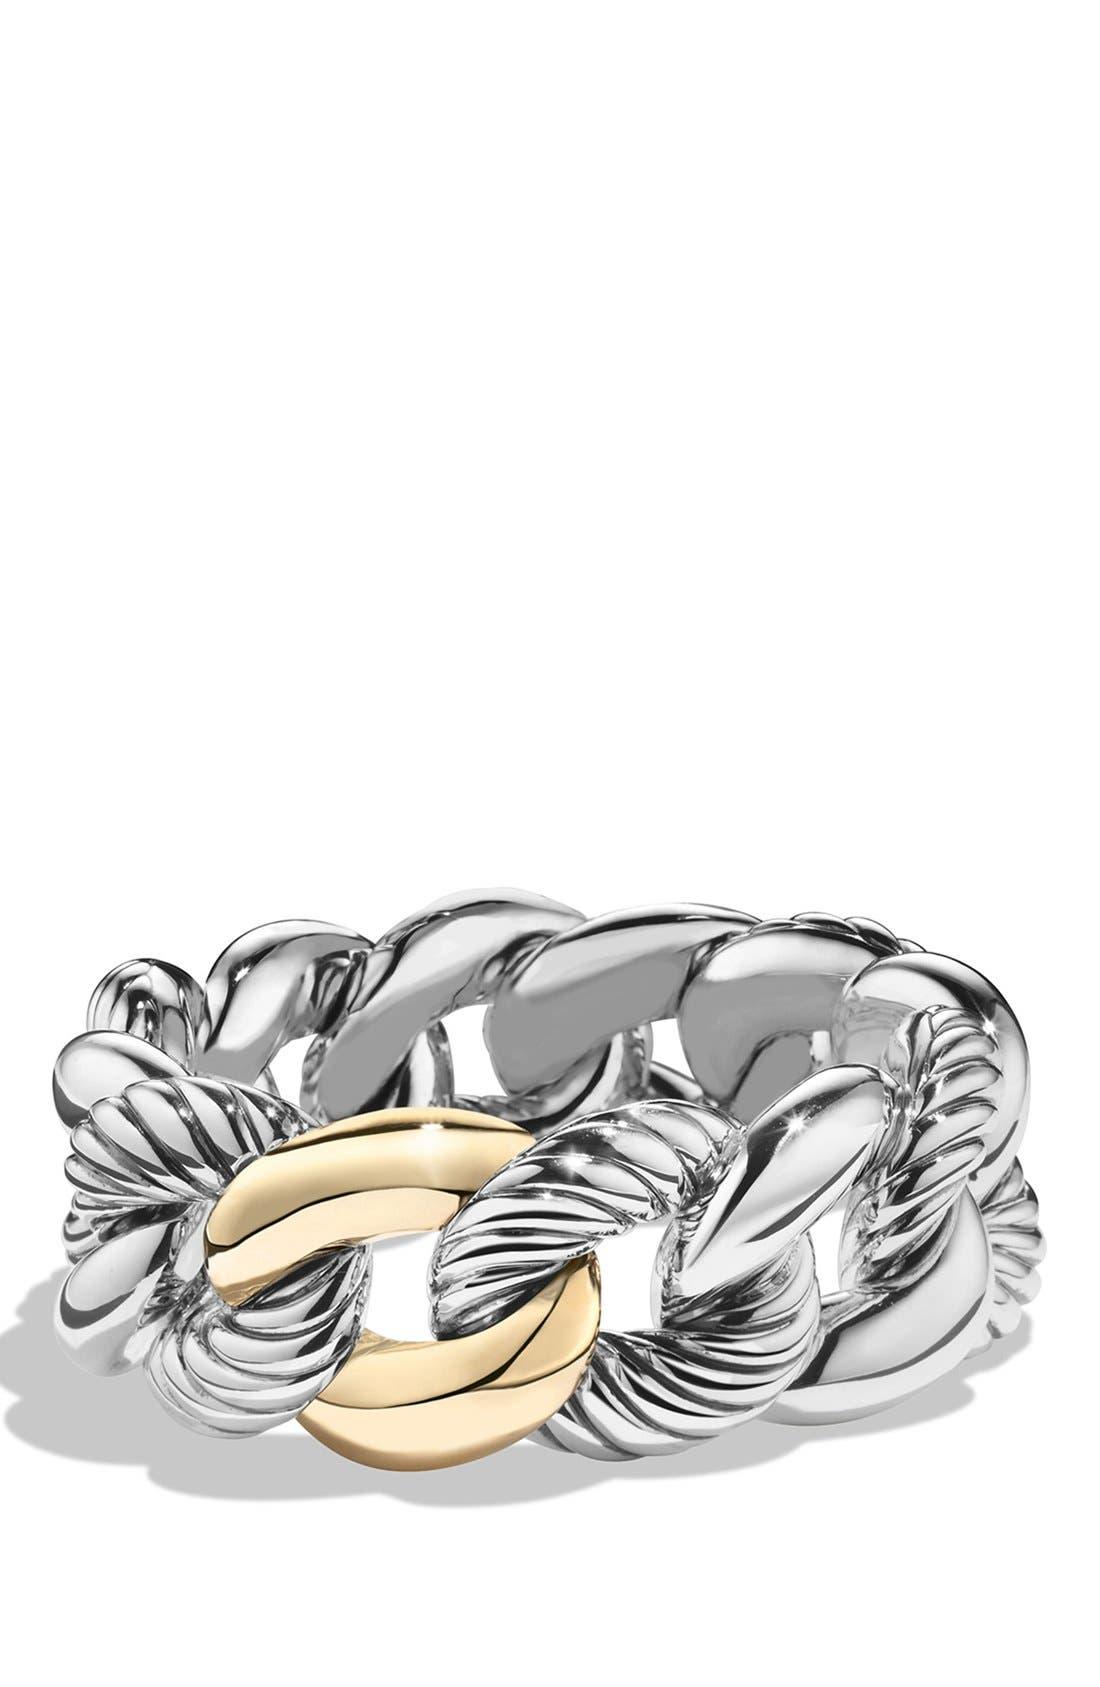 David Yurman 'Belmont' Curb Link Bracelet with 18K Gold